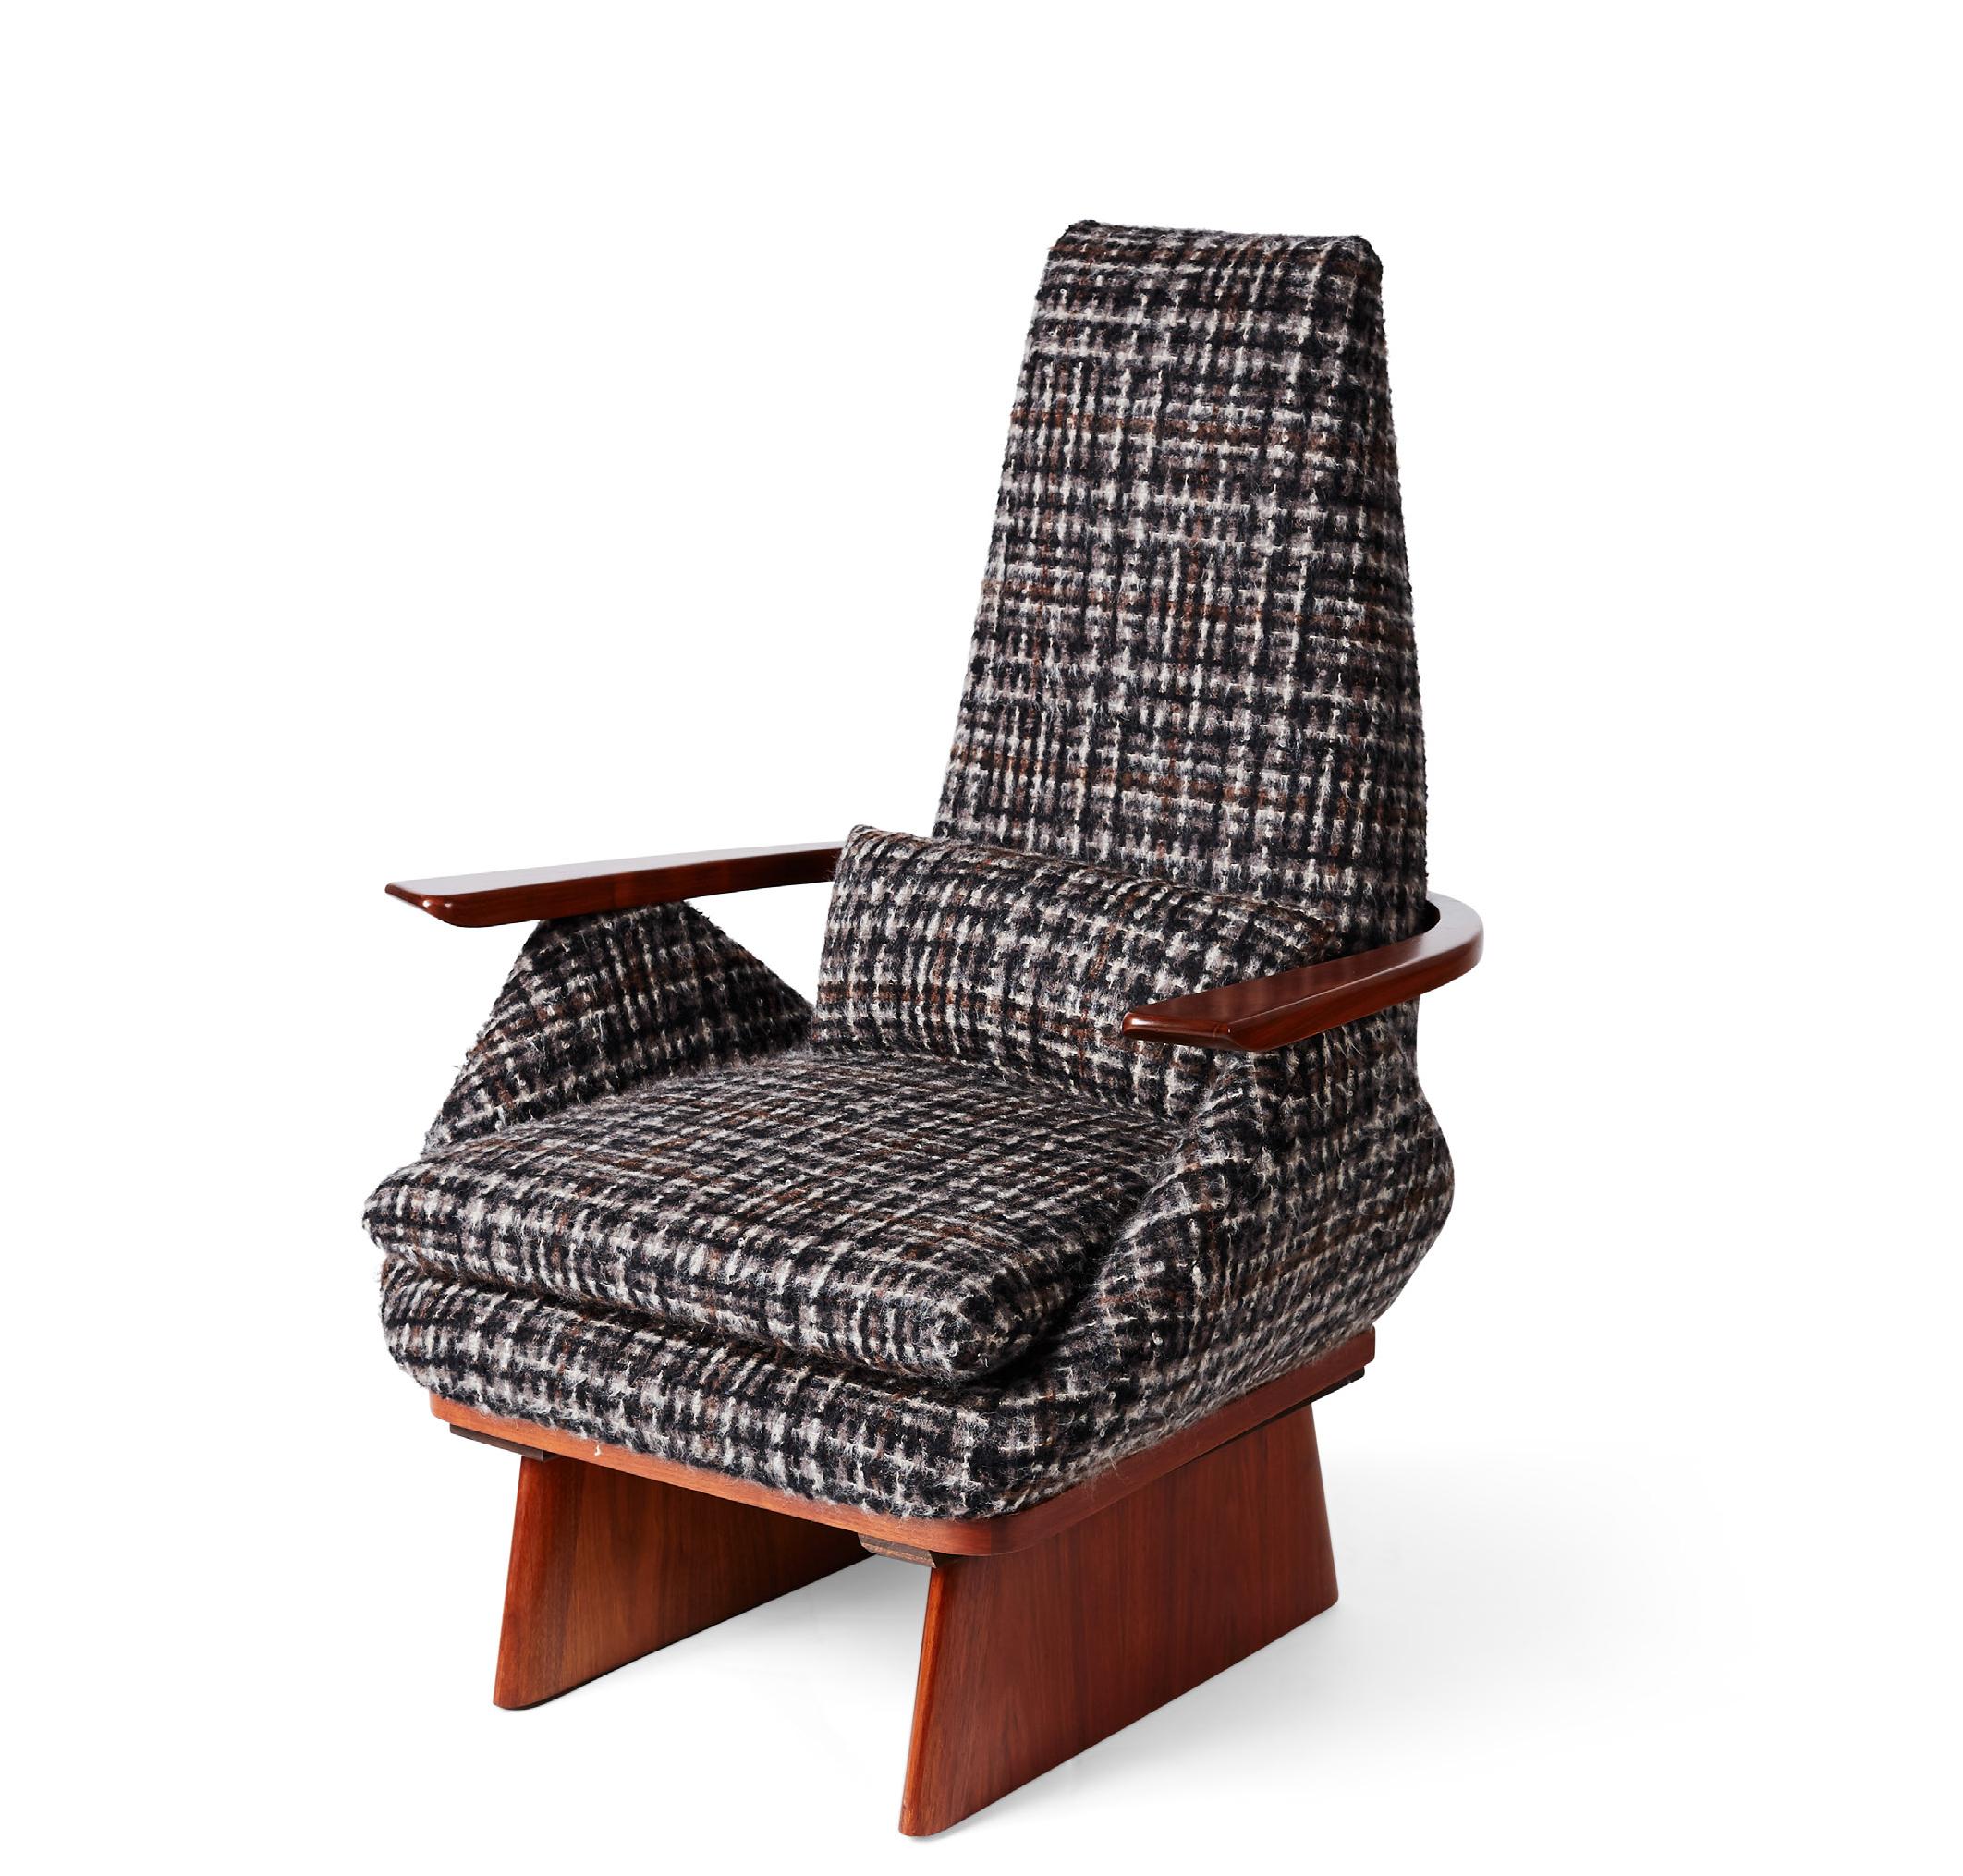 Sled Chair by Sampson Berman Studio